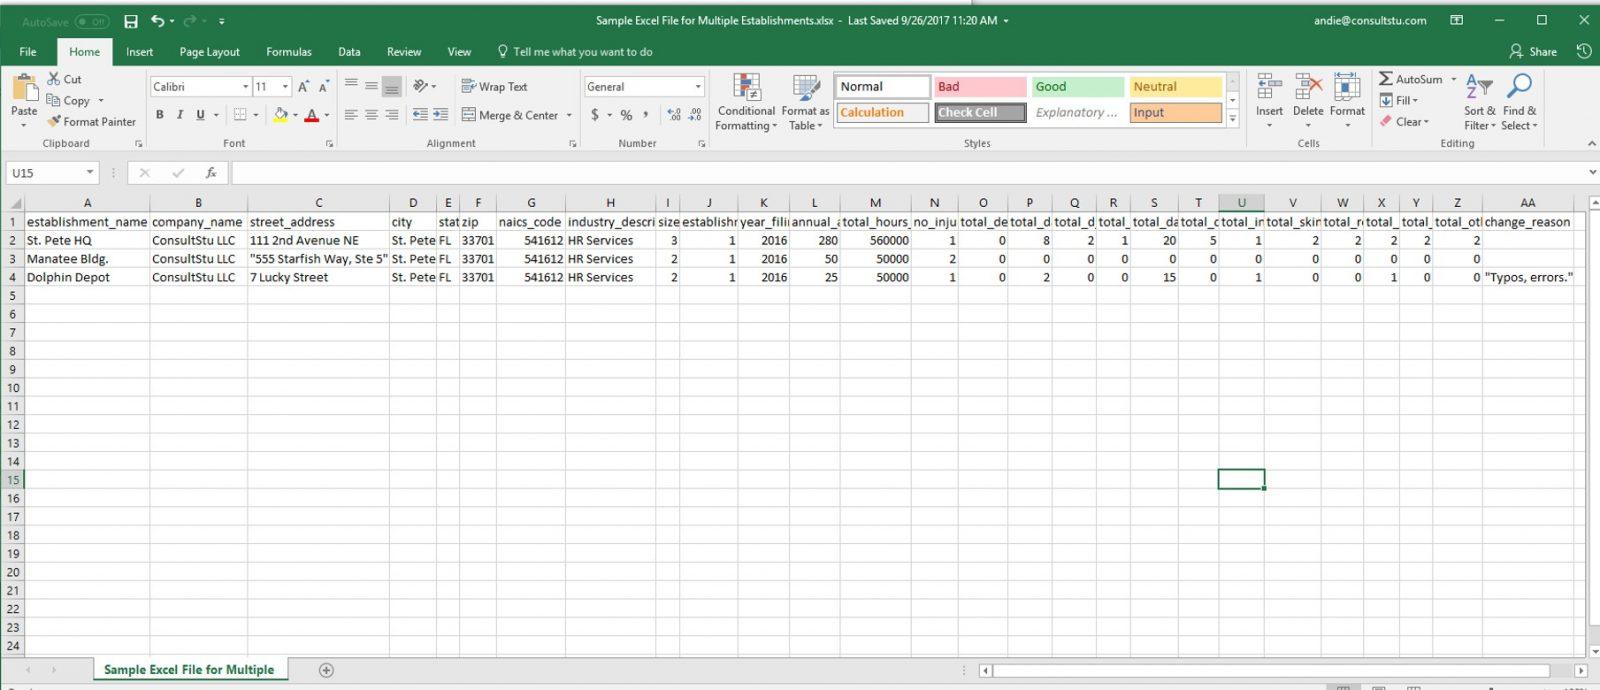 Ncci Edits Excel Spreadsheet